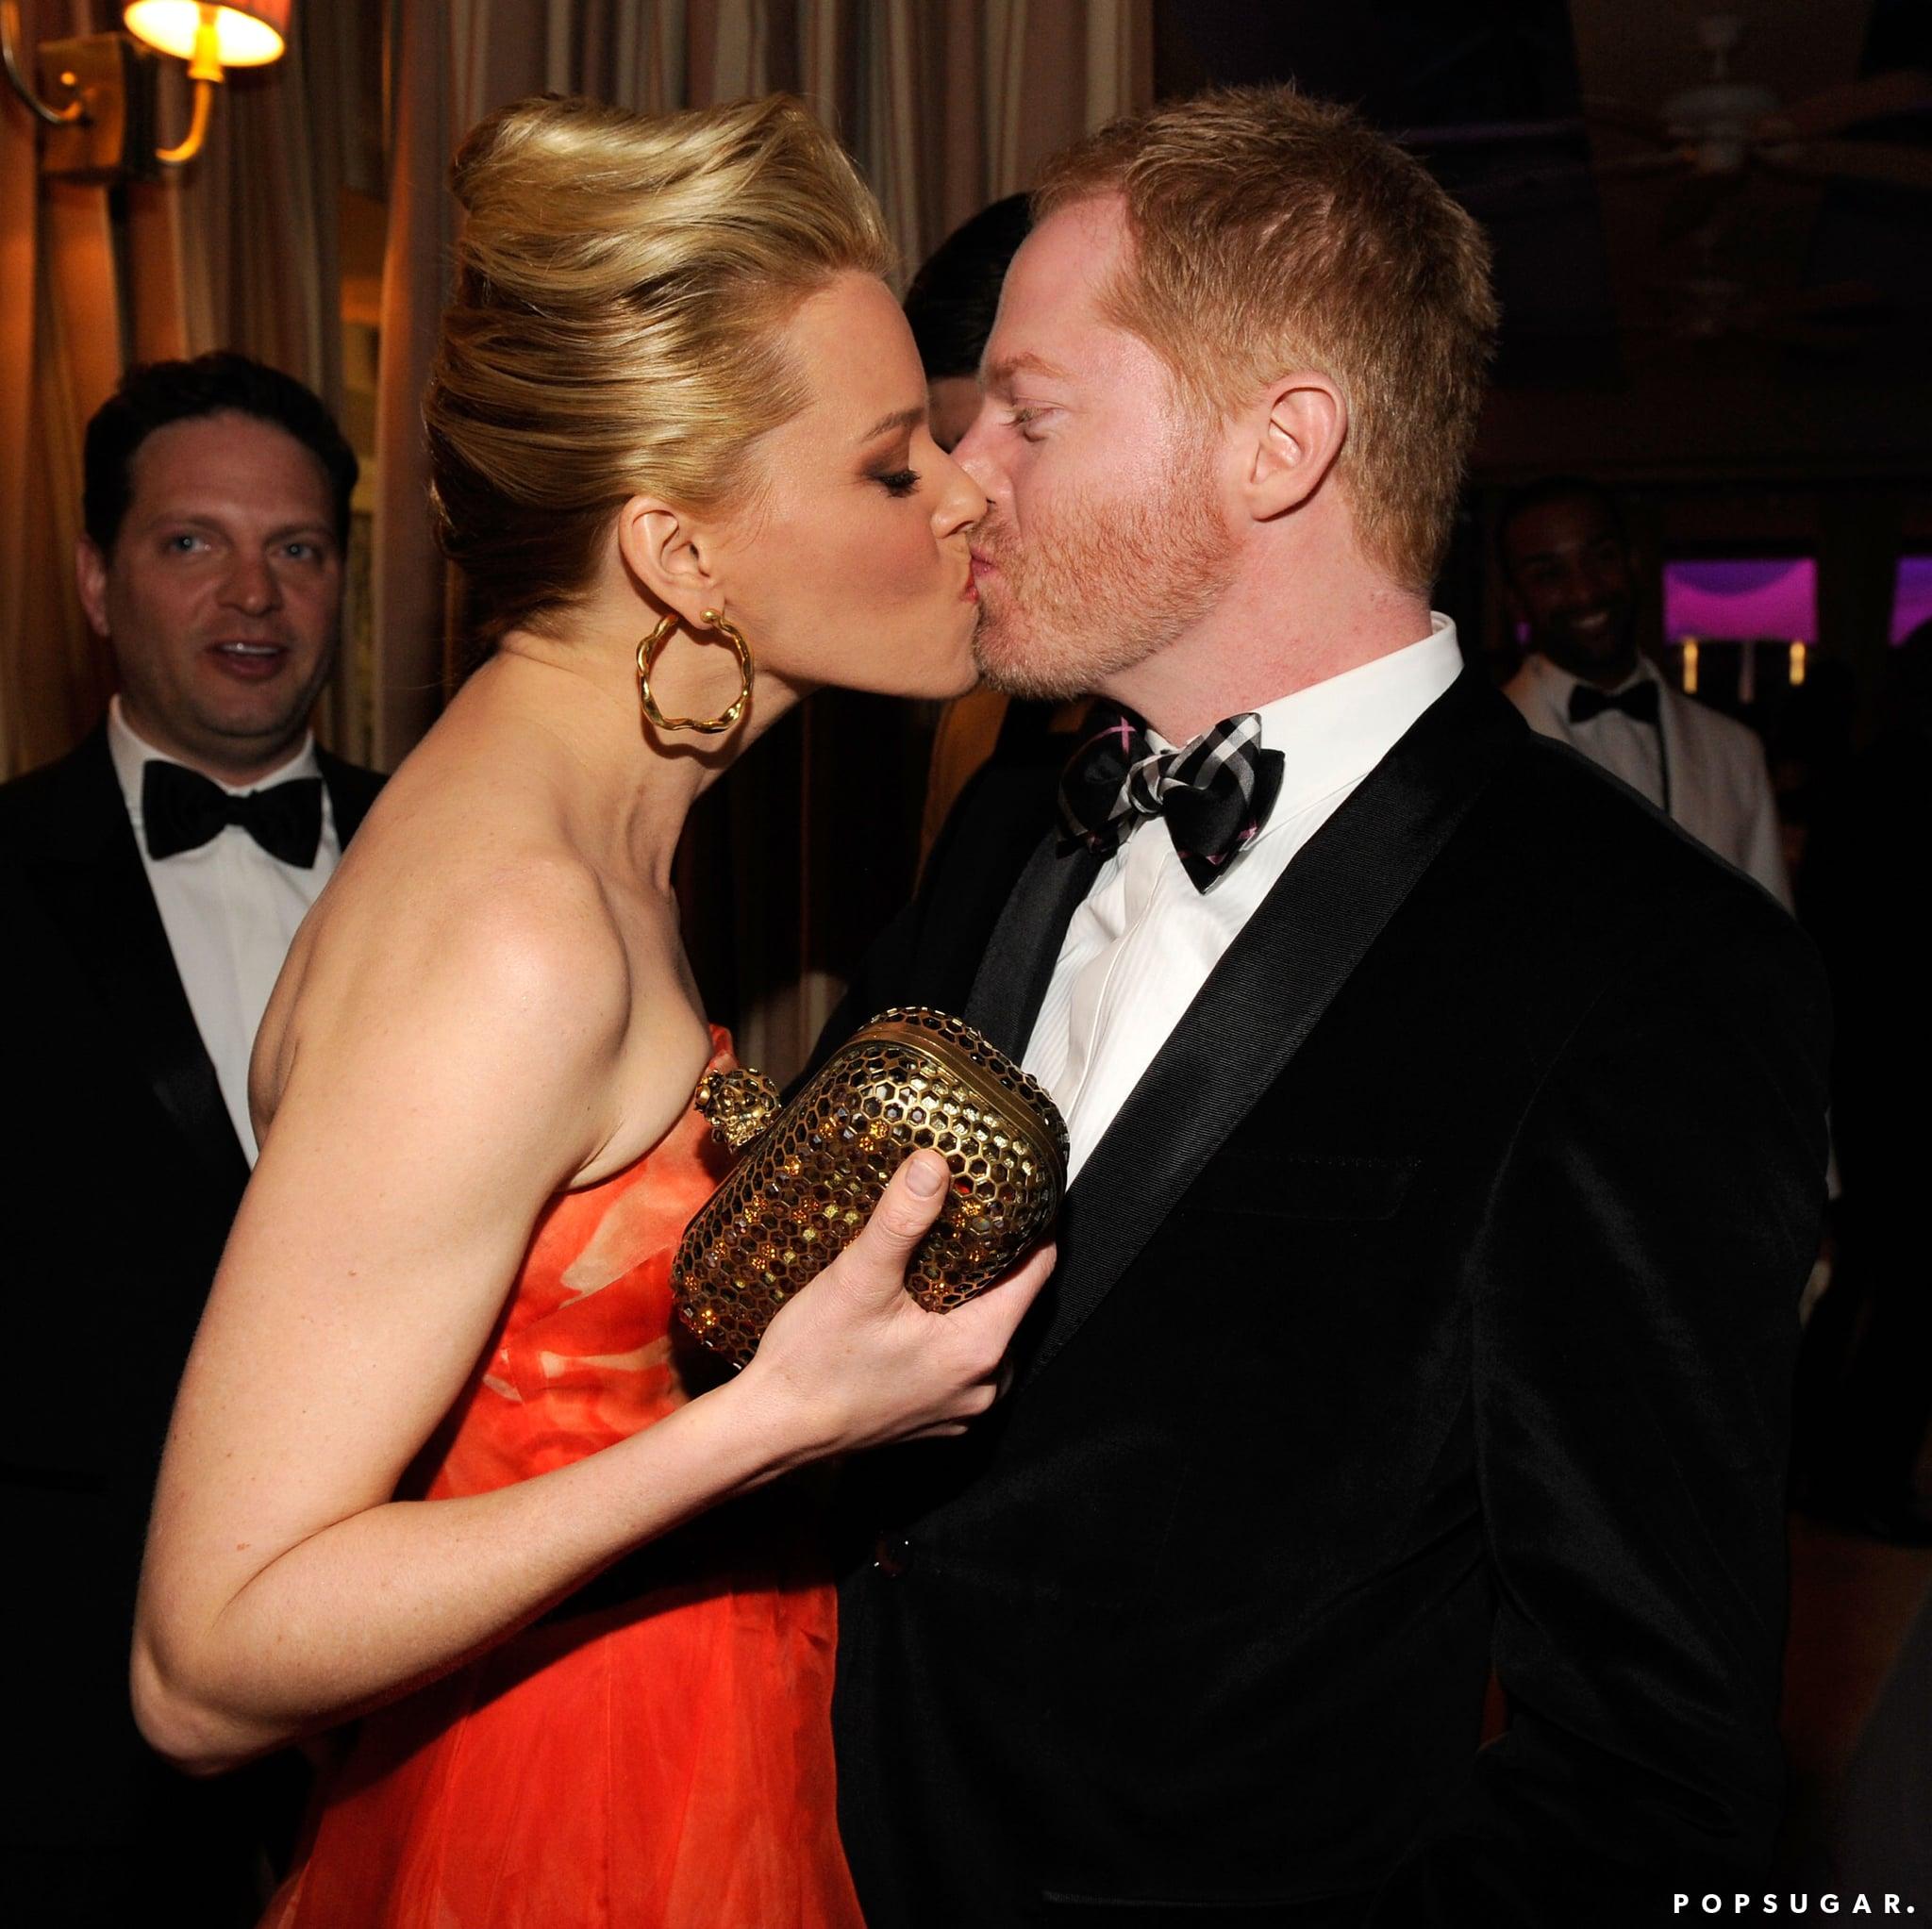 Elizabeth Banks and Jesse Tyler Ferguson locked lips inside the Vanity Fair Oscar party on Sunday in Hollywood.